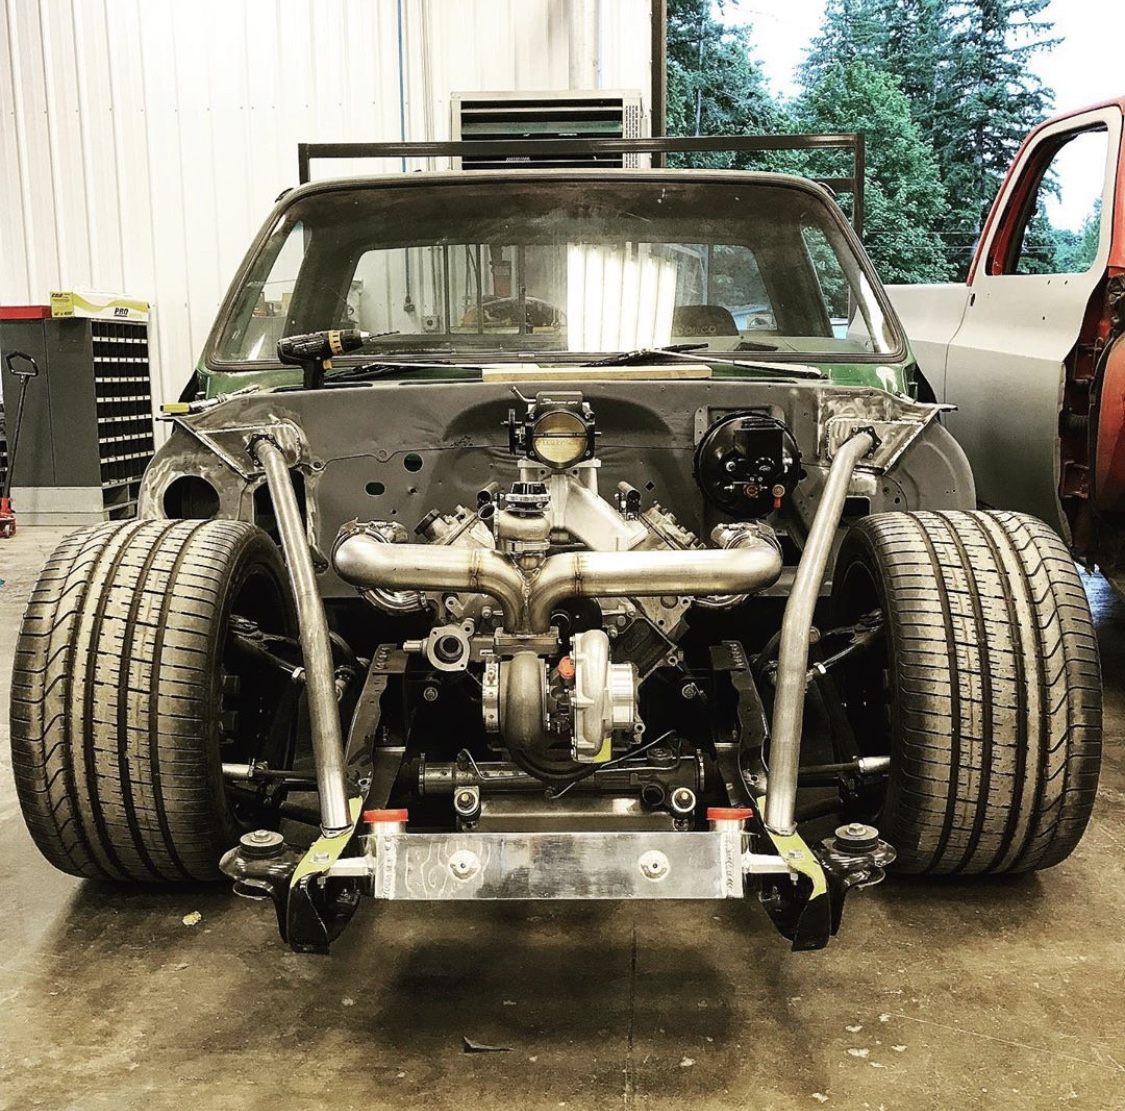 355 wide tires